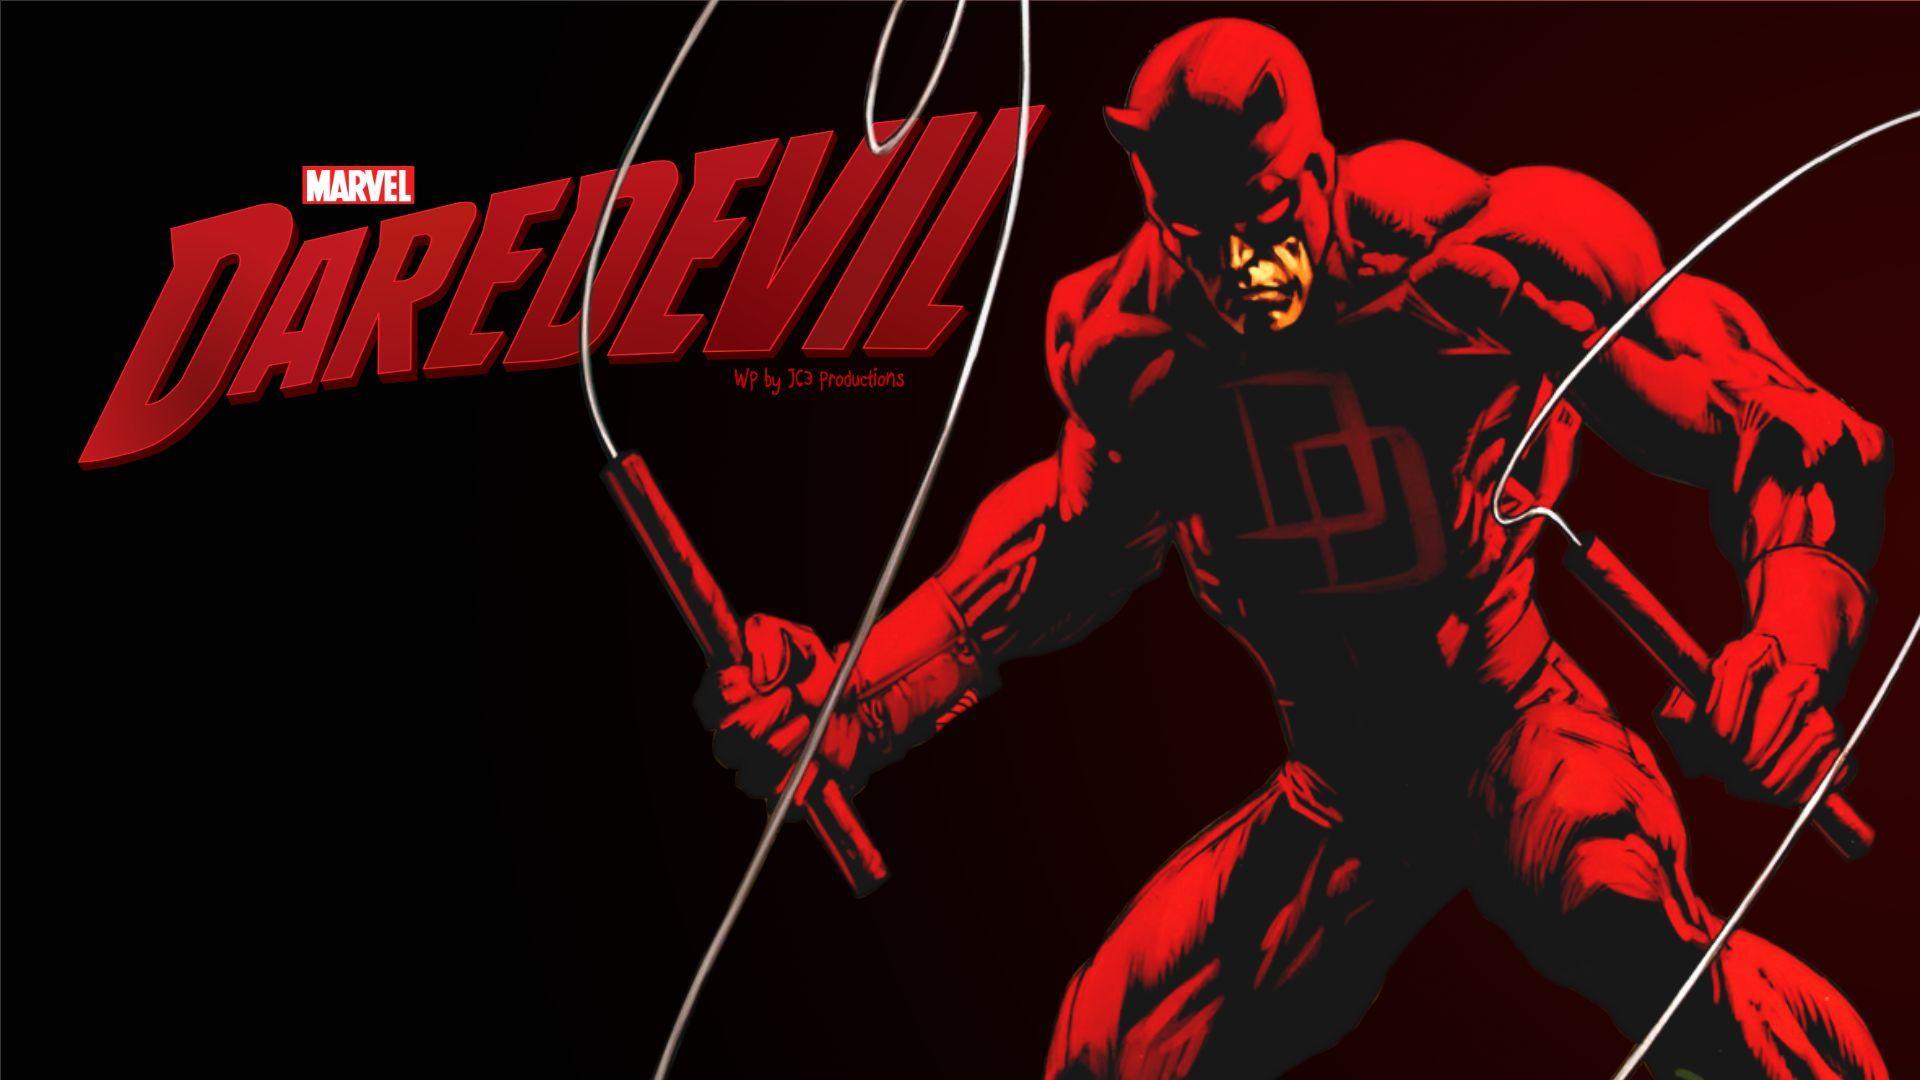 Marvel's Daredevil Wallpapers - Wallpaper Cave